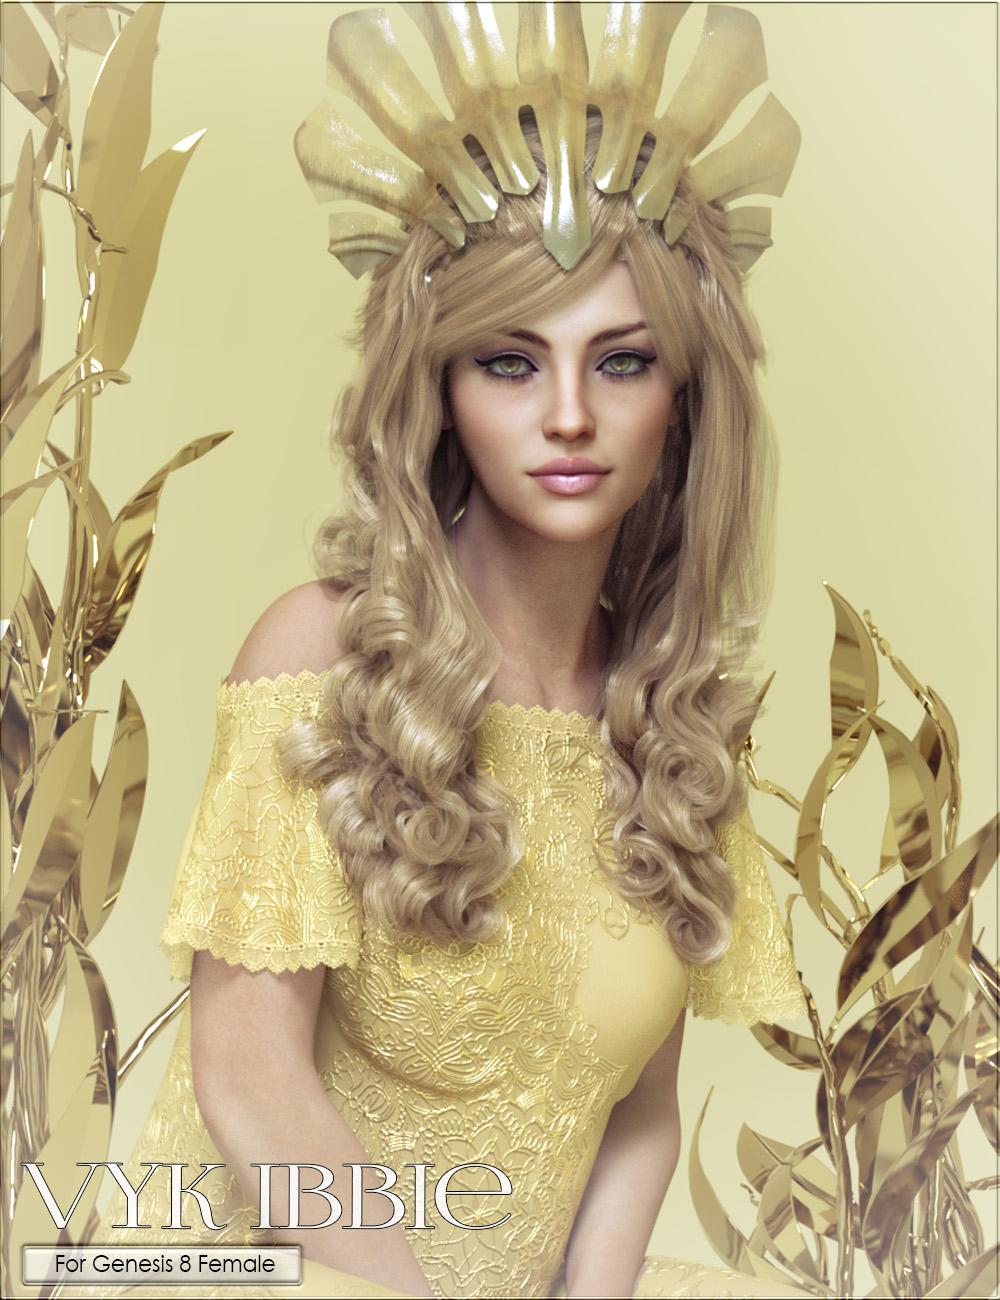 VYK Ibbie for Genesis 8 Female by: vyktohria, 3D Models by Daz 3D